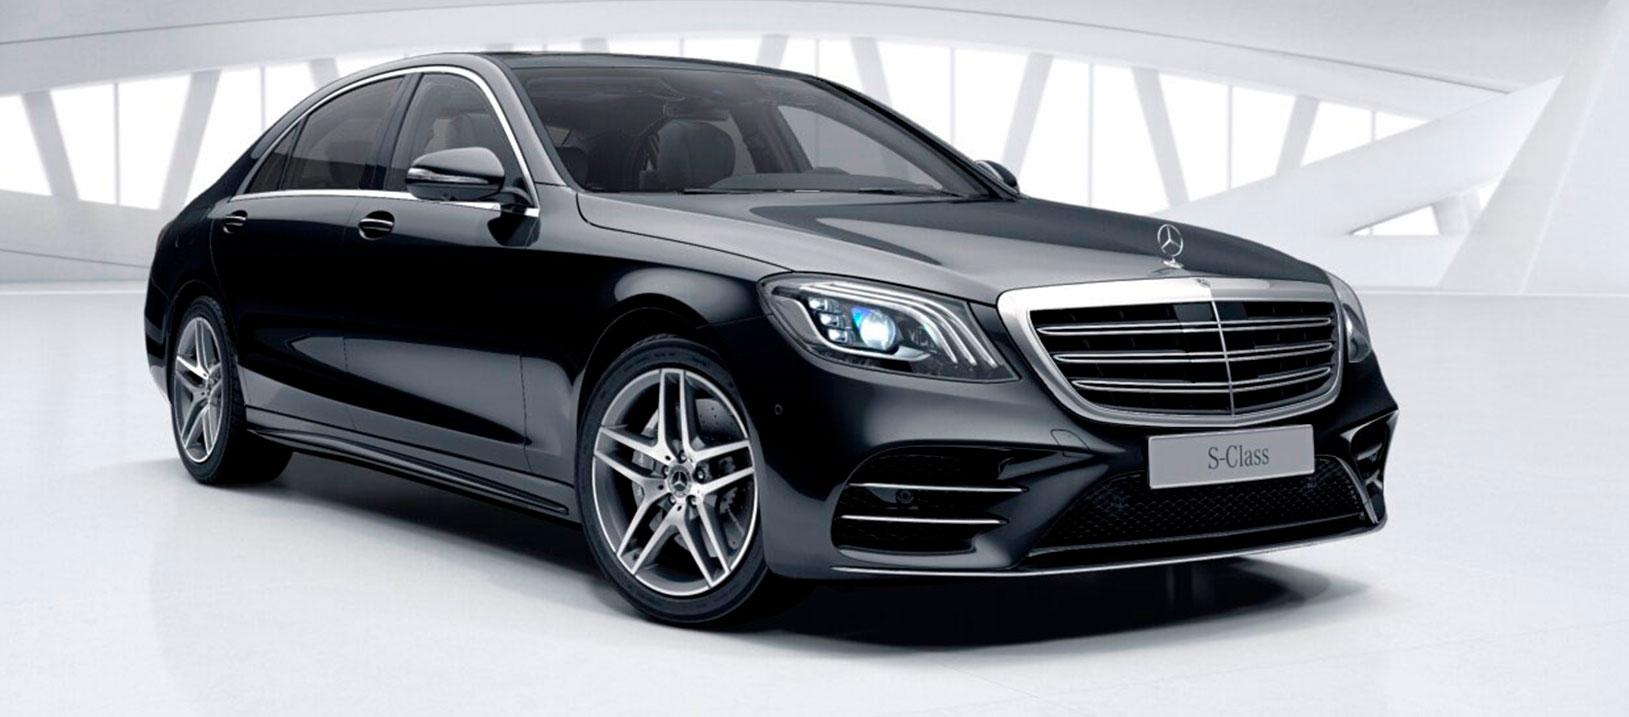 Mercedes-Benz S 400 d 4MATIC long 52600179